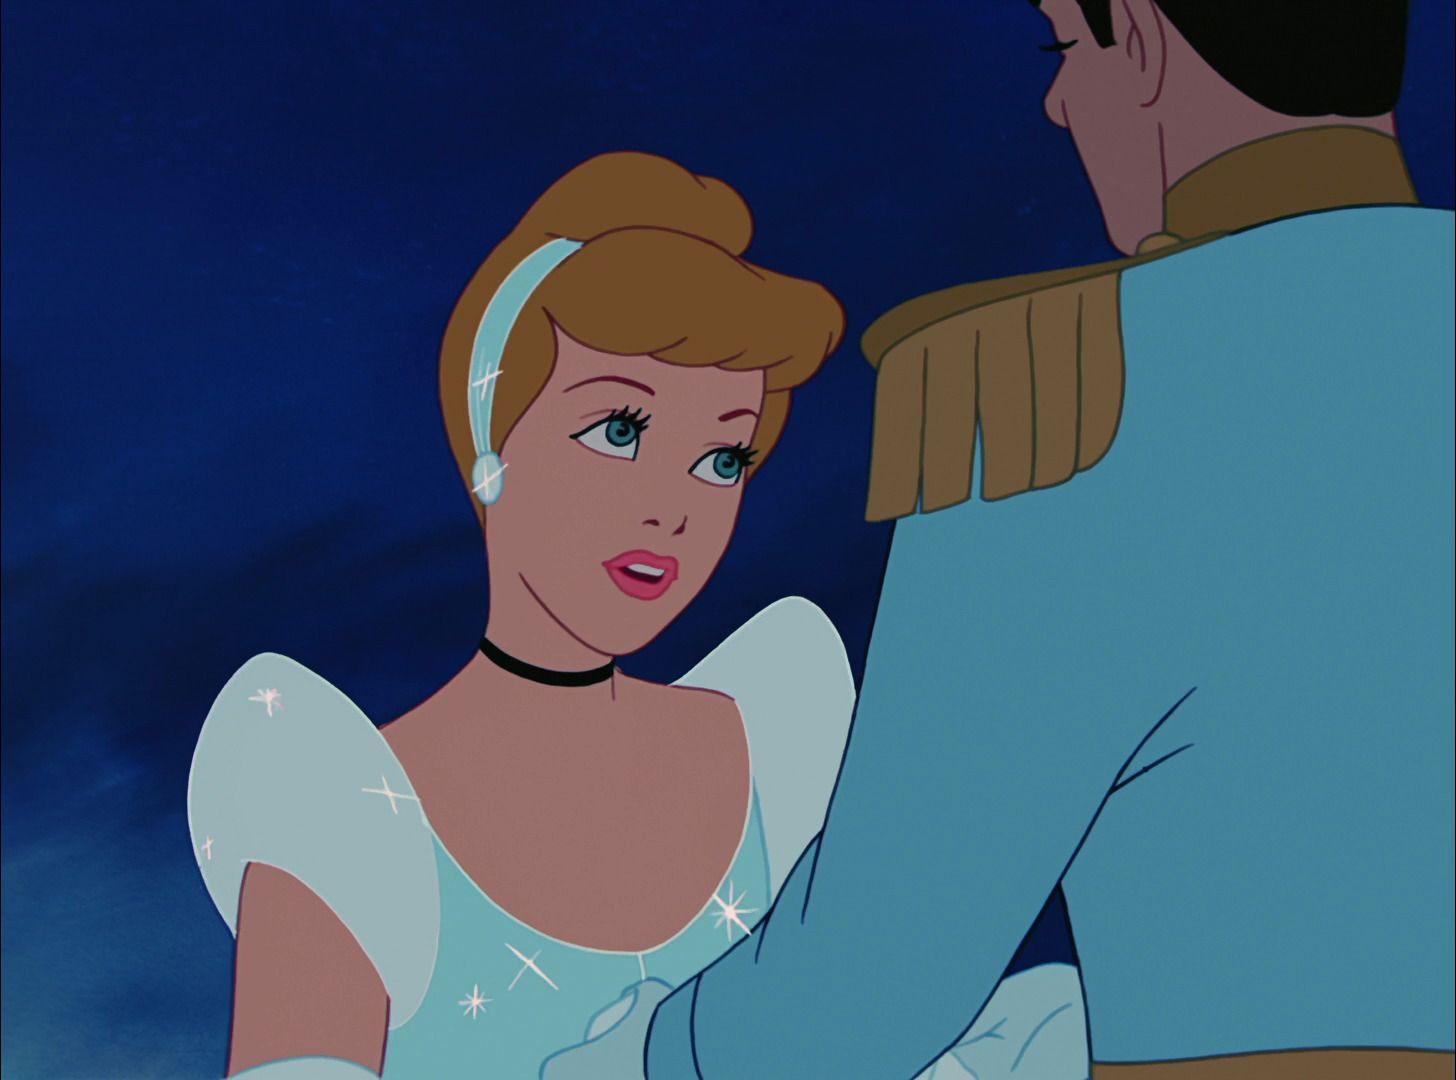 CINDERELLA & PRINCE CHARMING ~ Cinderella (1950) ...At the ball ...